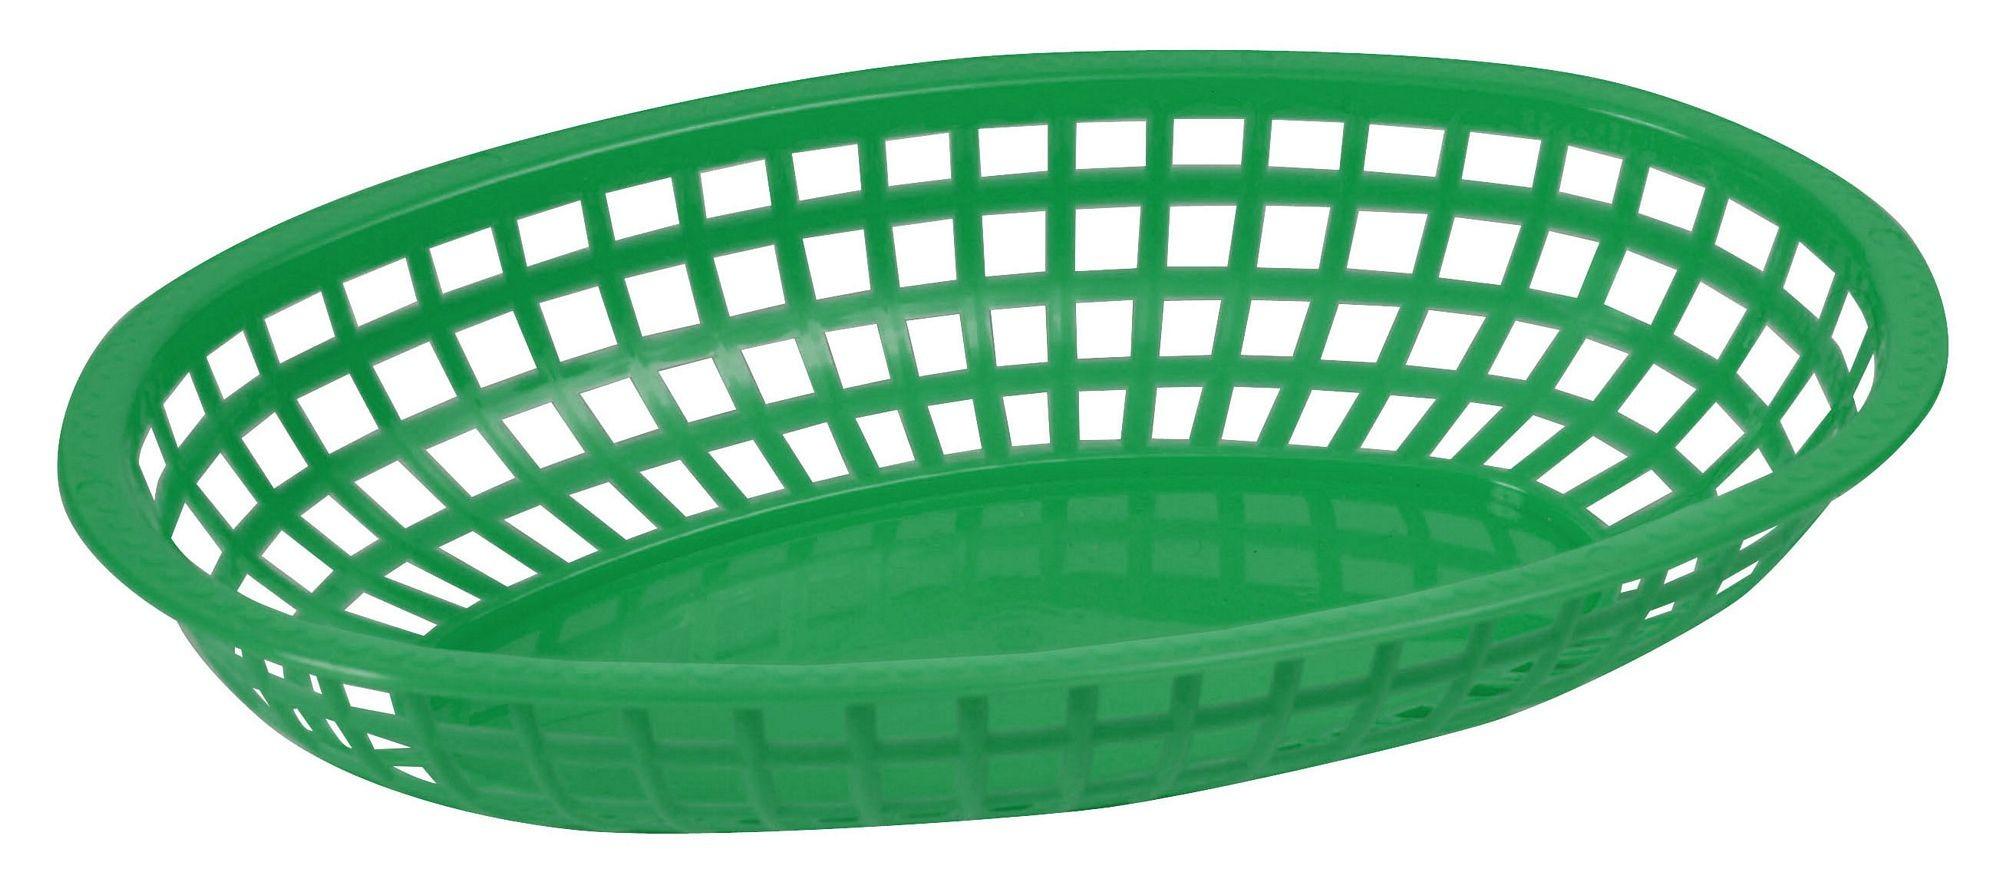 "Winco POB-G Green Premium Oval Basket 10-1/4"" x 6-3/4"" x 2"""